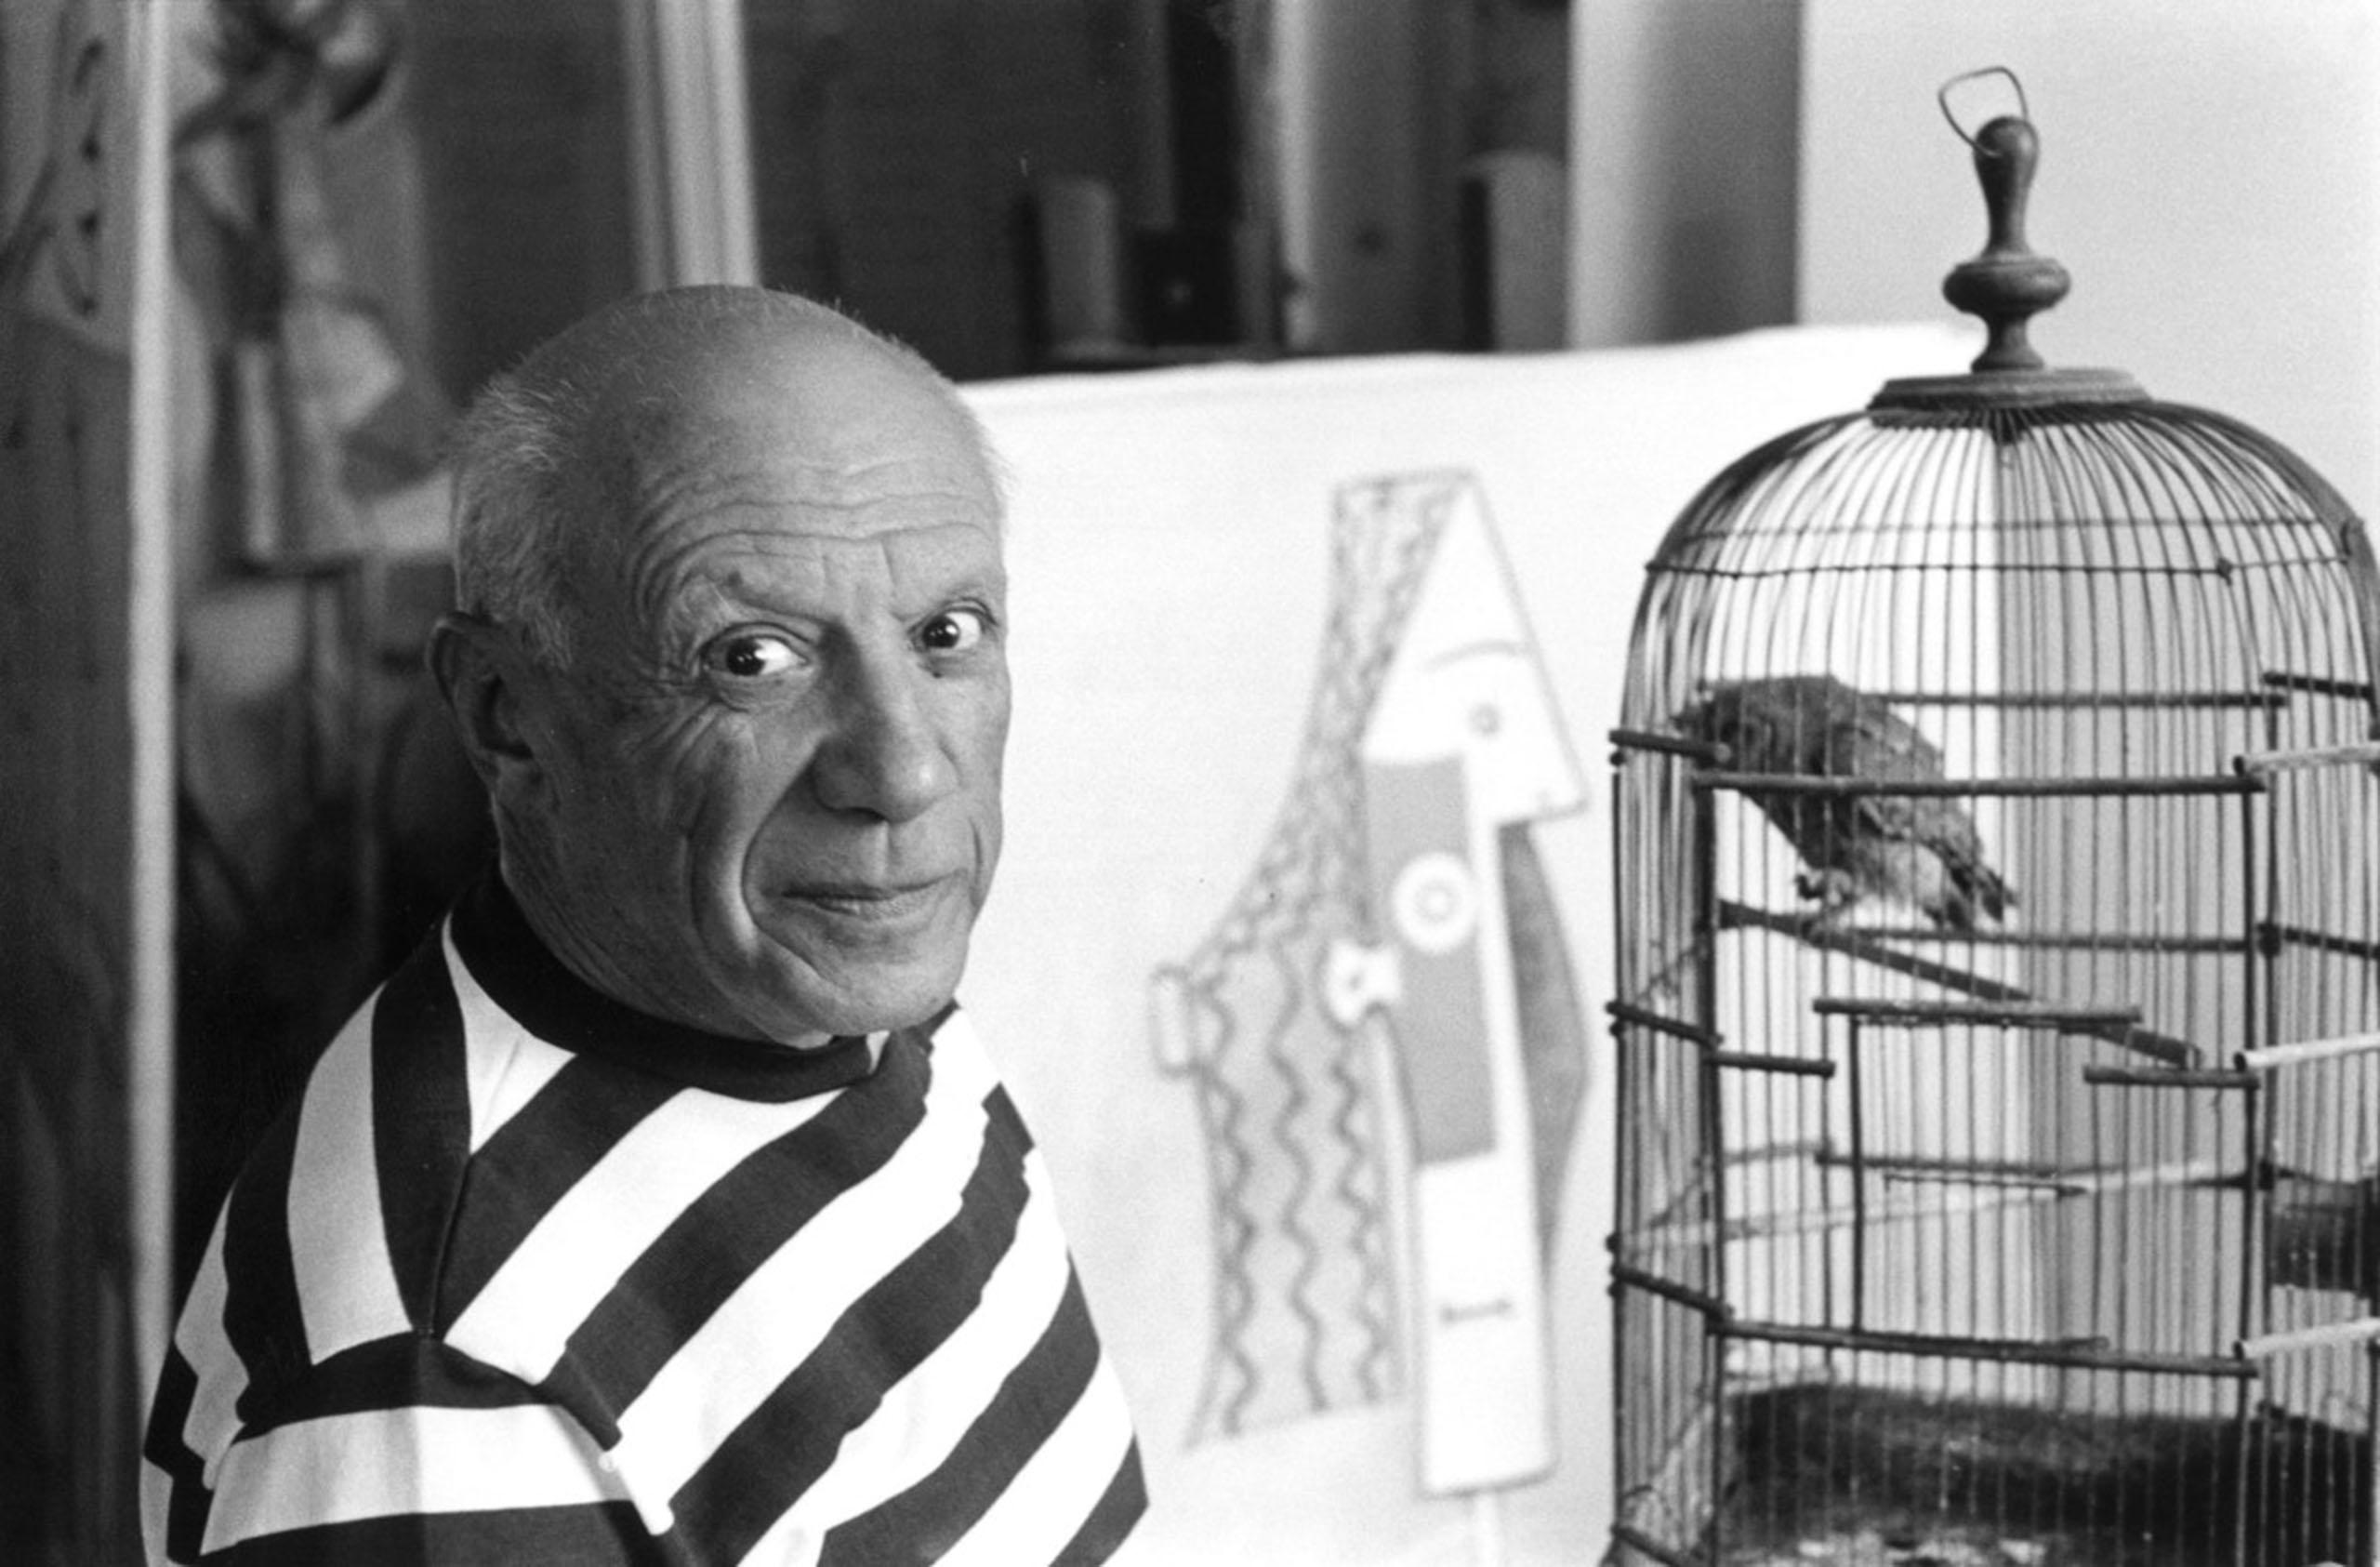 Pablo Picasso, Cannes. 1957.